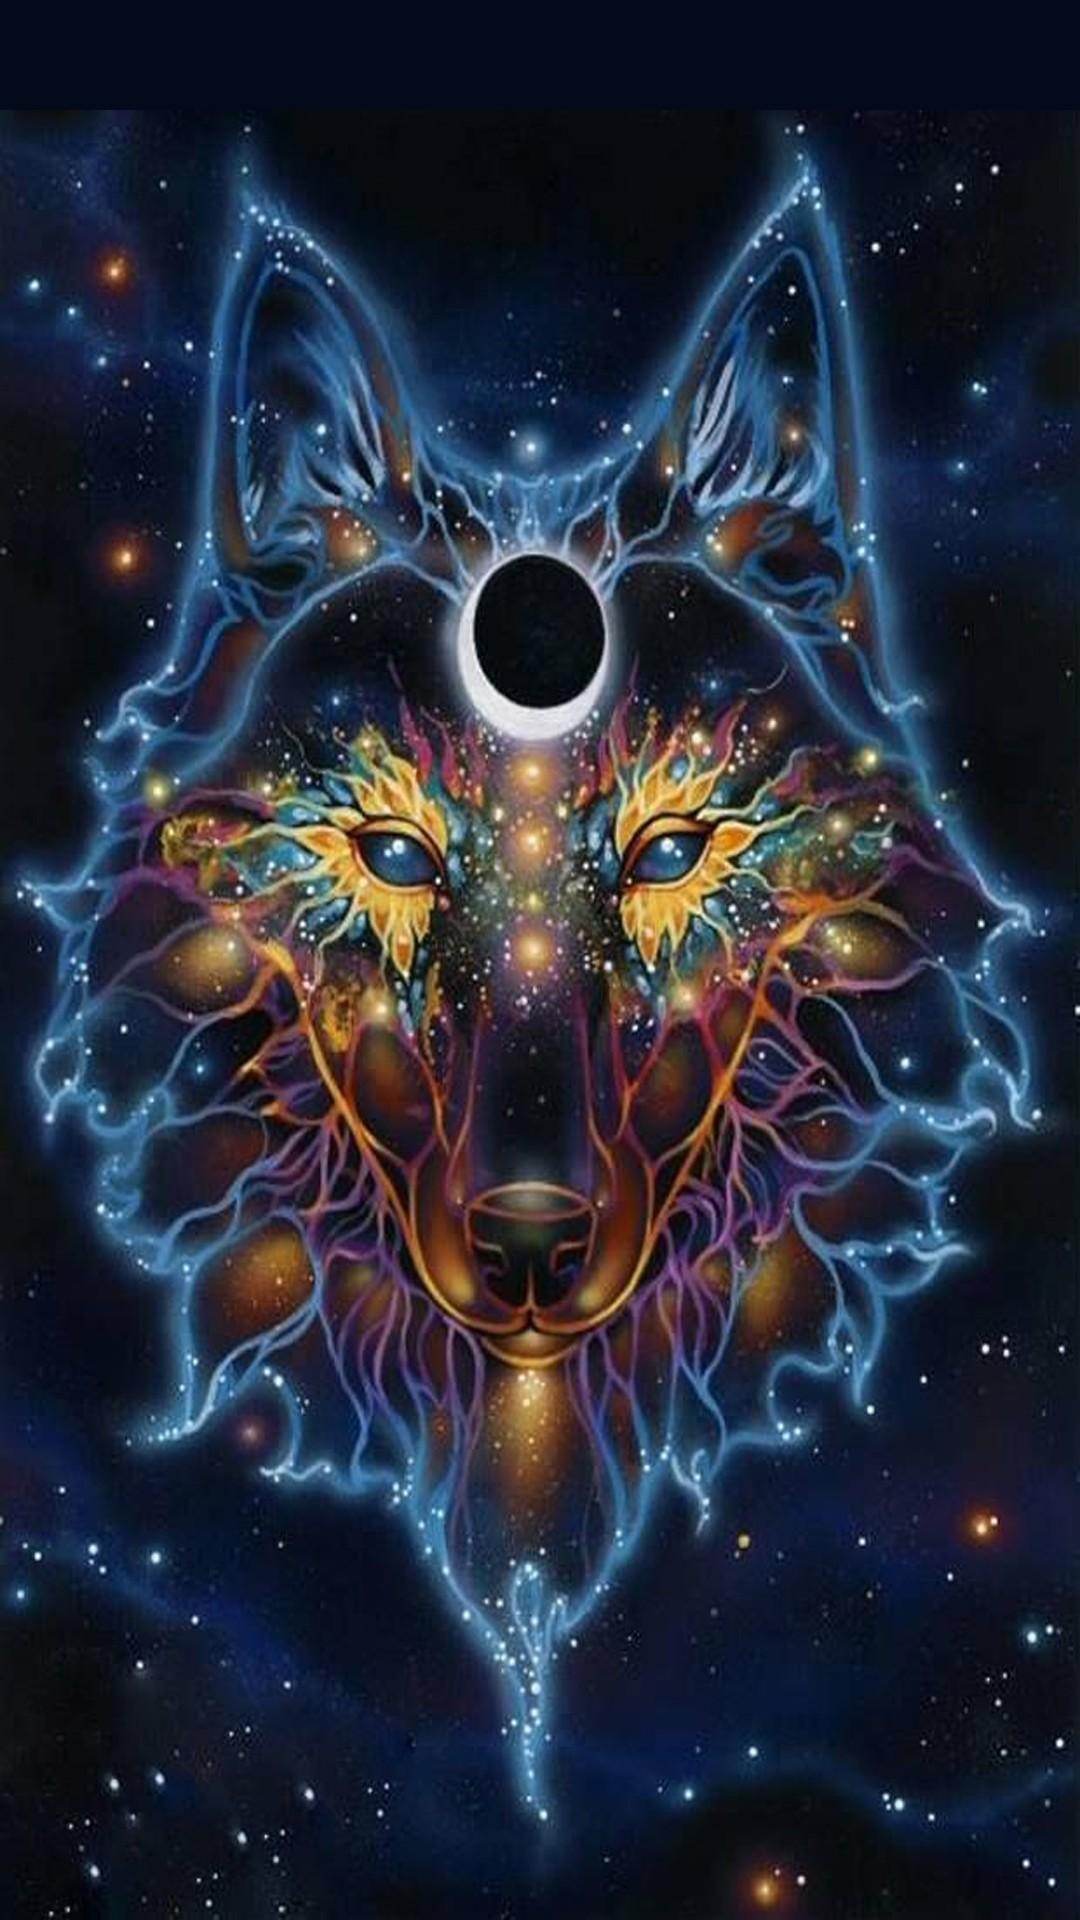 Wolf Iphone Wallpaper wolf white_3ef9375b8993cf519c783a4b44ee68b6_raw Wolf  Iphone Wallpaper  fozaHoN1SxYzAUguZde17rsIo1DtnGBtPv7xXoVruuqWg8jv4h44nFsw5qvPlcNL …